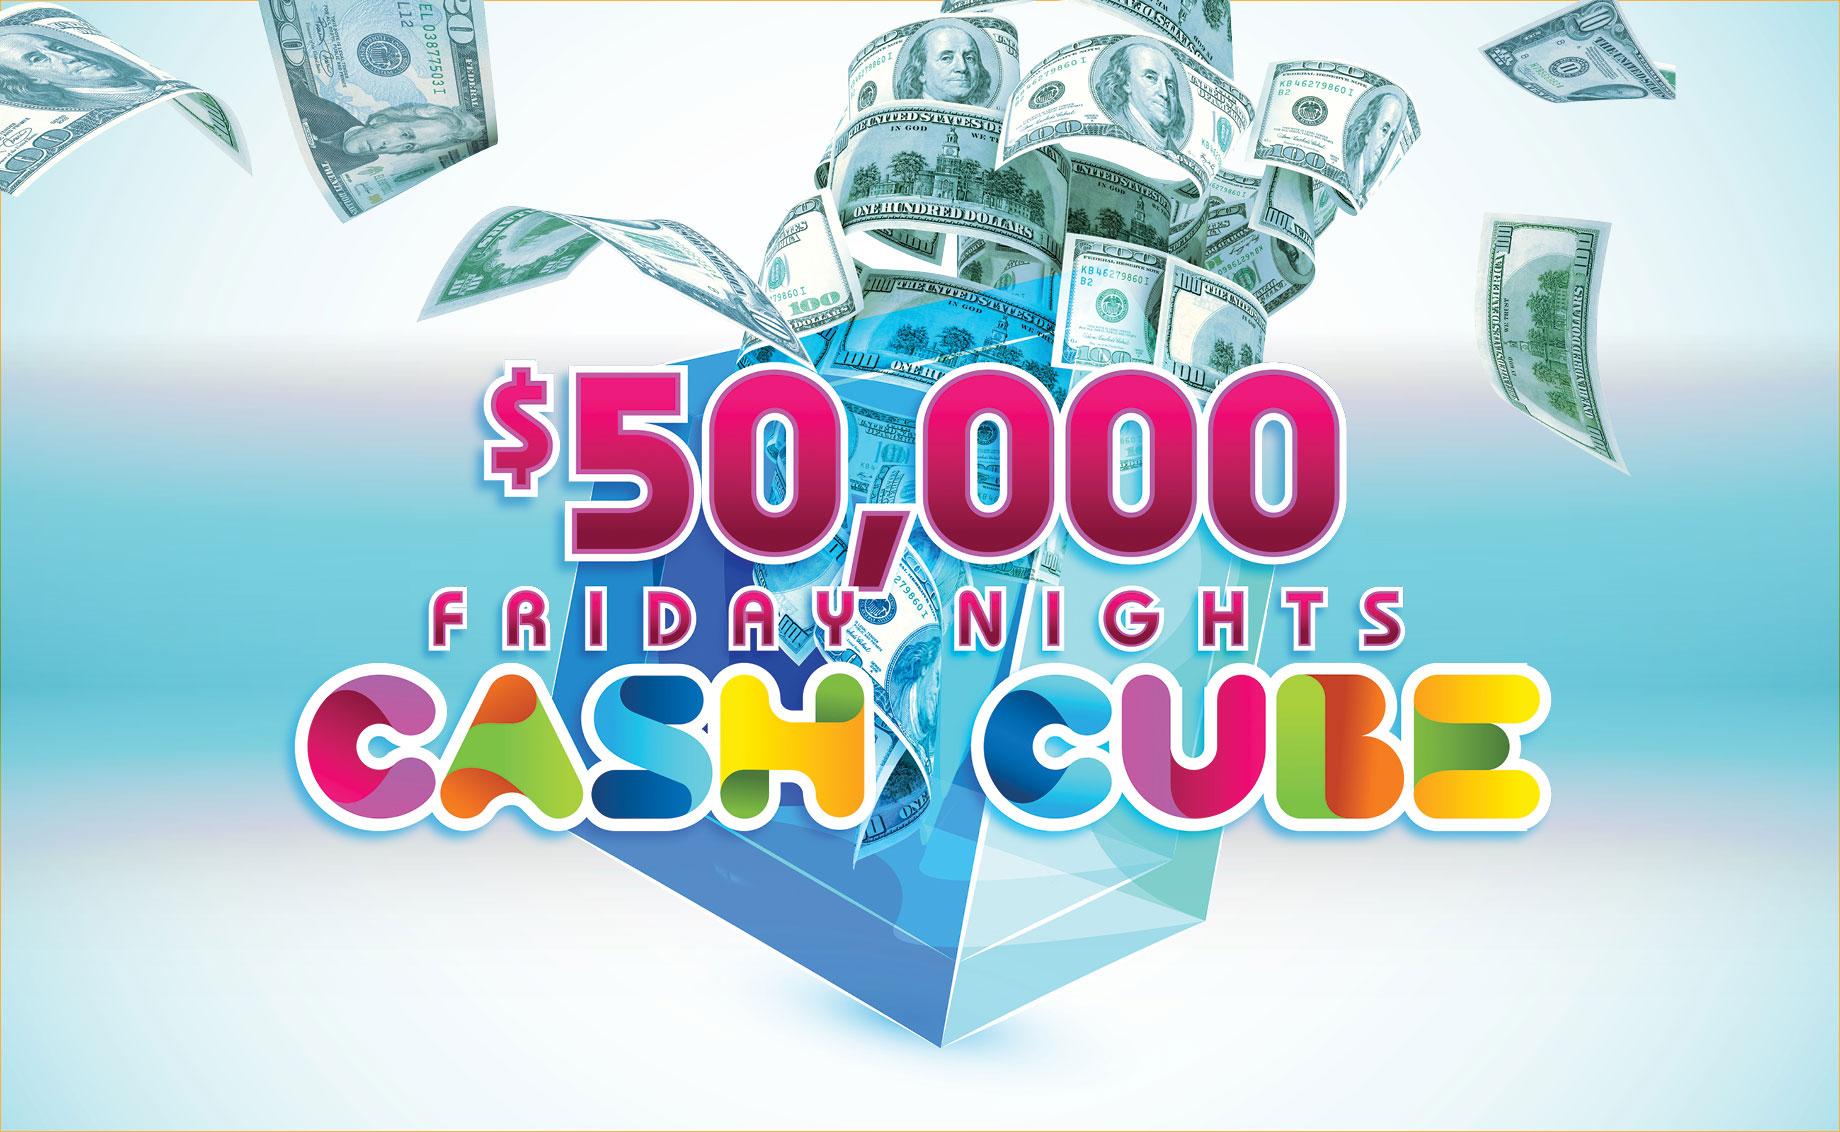 Friday Nights Cash Cube